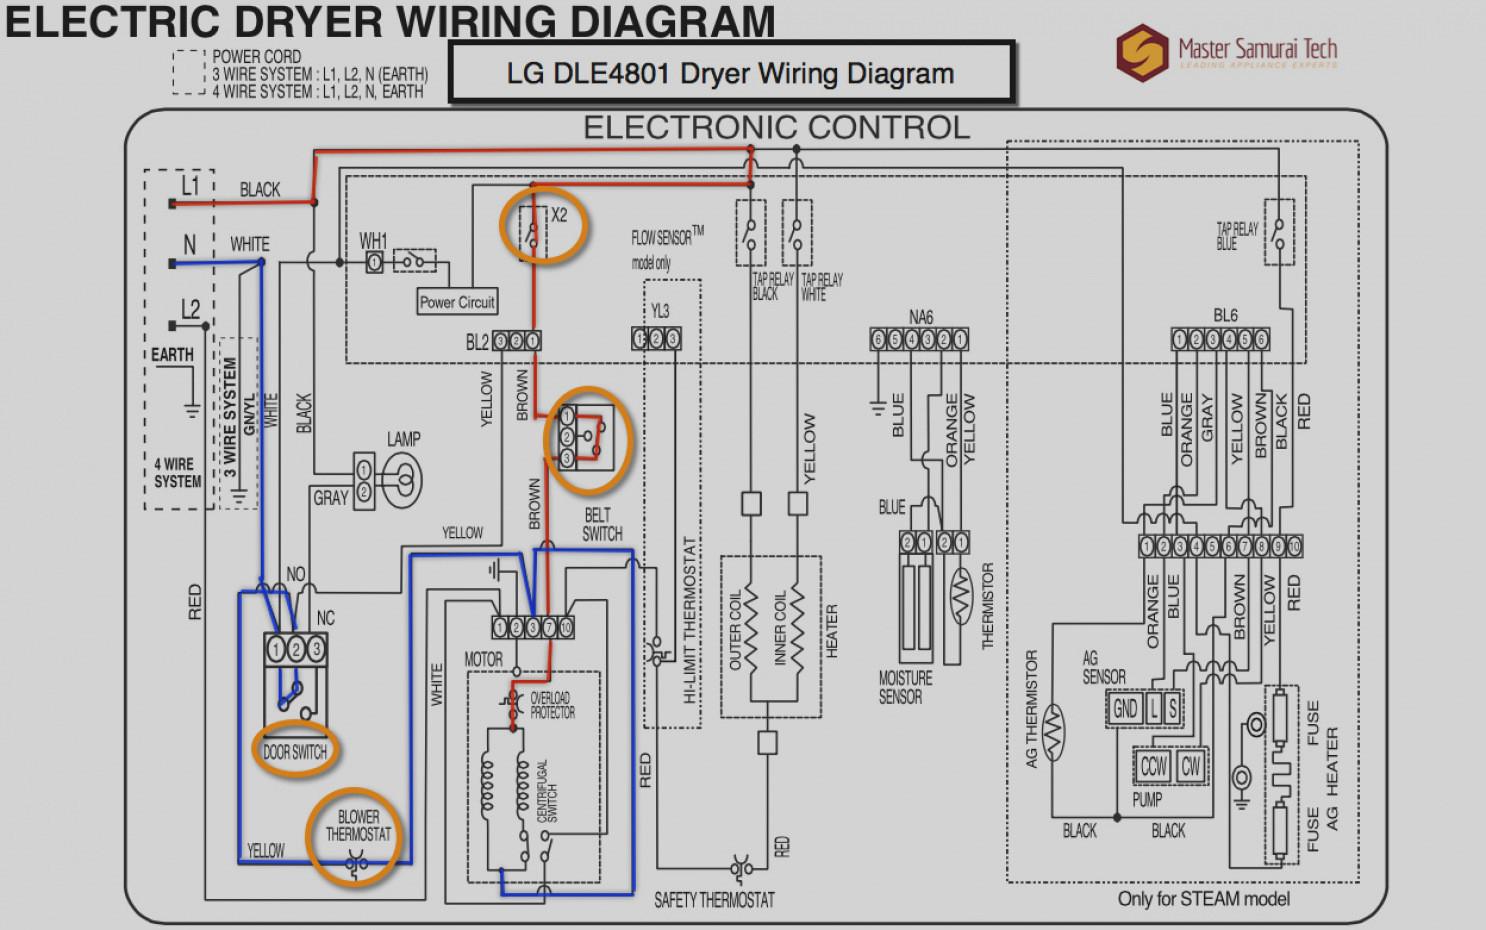 crosley dryer diagram wiring schematic diagramwiring diagram for crosley dryer wiring diagram crosley parts crosley dryer wiring diagram manual e books